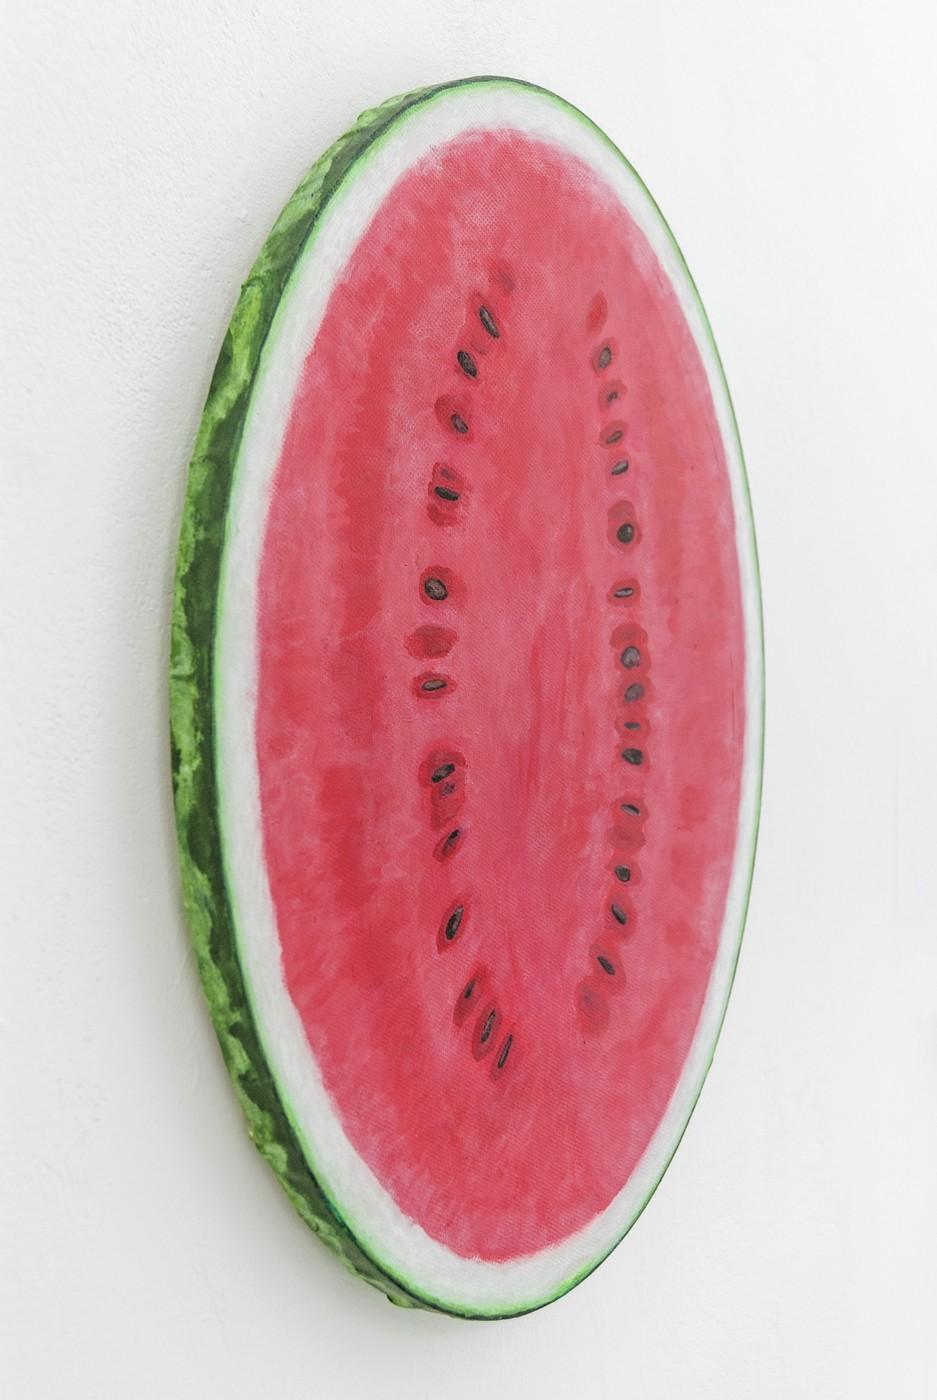 5.Watermelon